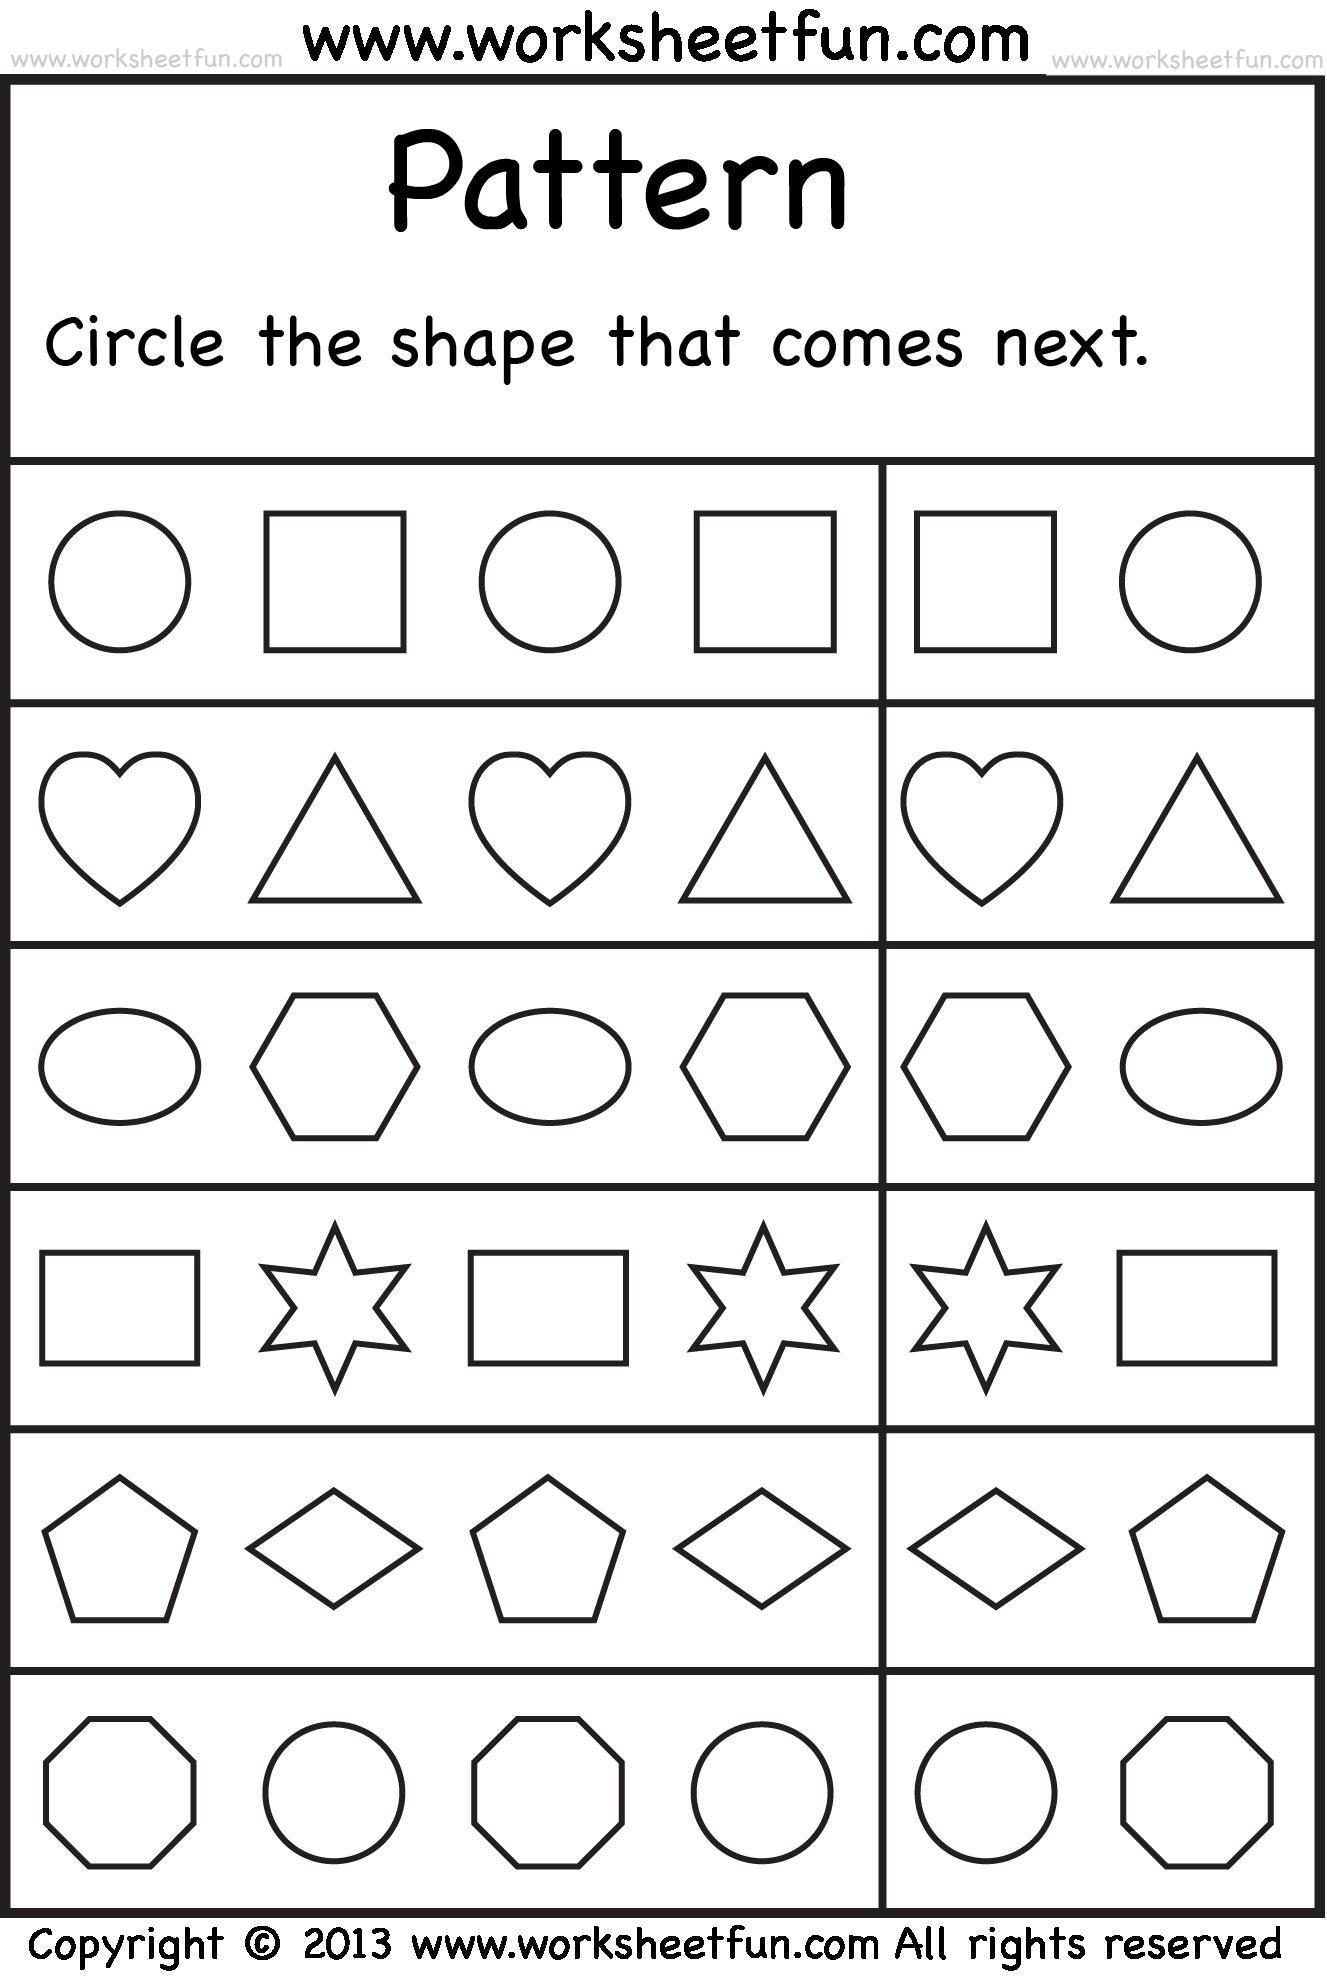 Free Printable Pattern Worksheets Worksheet With Number Patterns Free Kindergar Kindergarten Worksheets Pattern Worksheet Kindergarten Math Worksheets Free